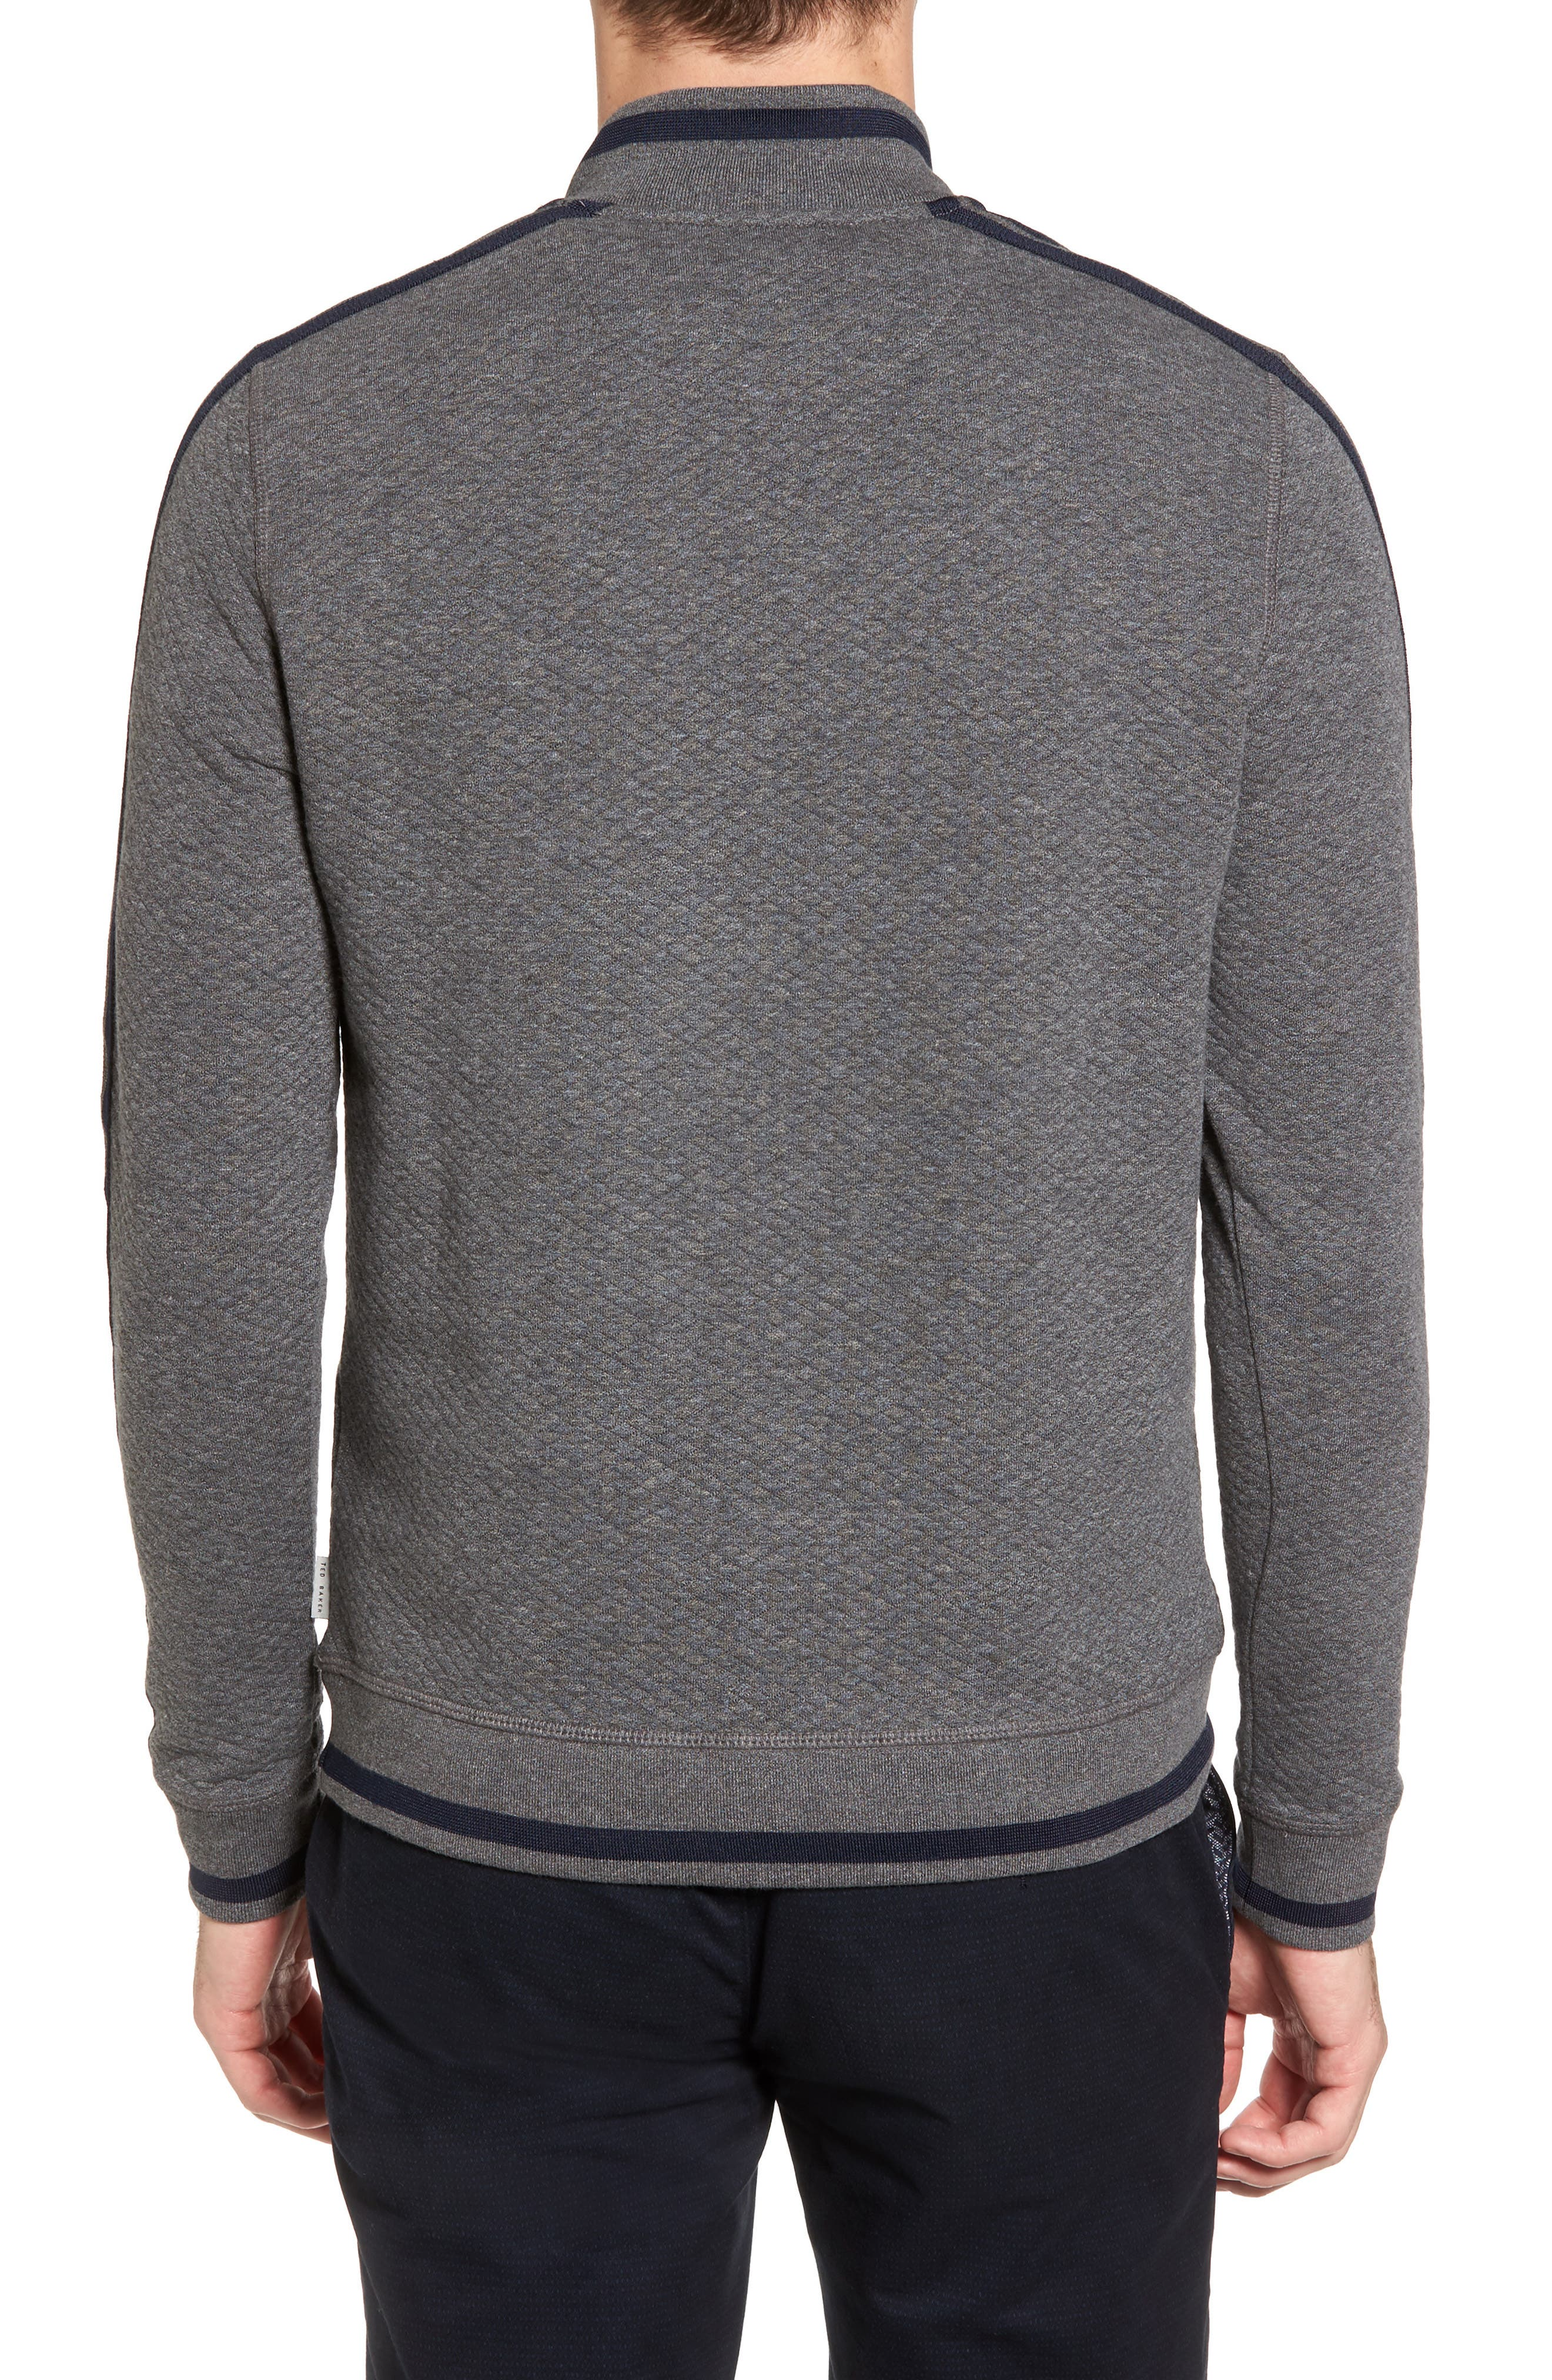 Sidney Quilted Quarter Zip Sweatshirt,                             Alternate thumbnail 2, color,                             Charcaol